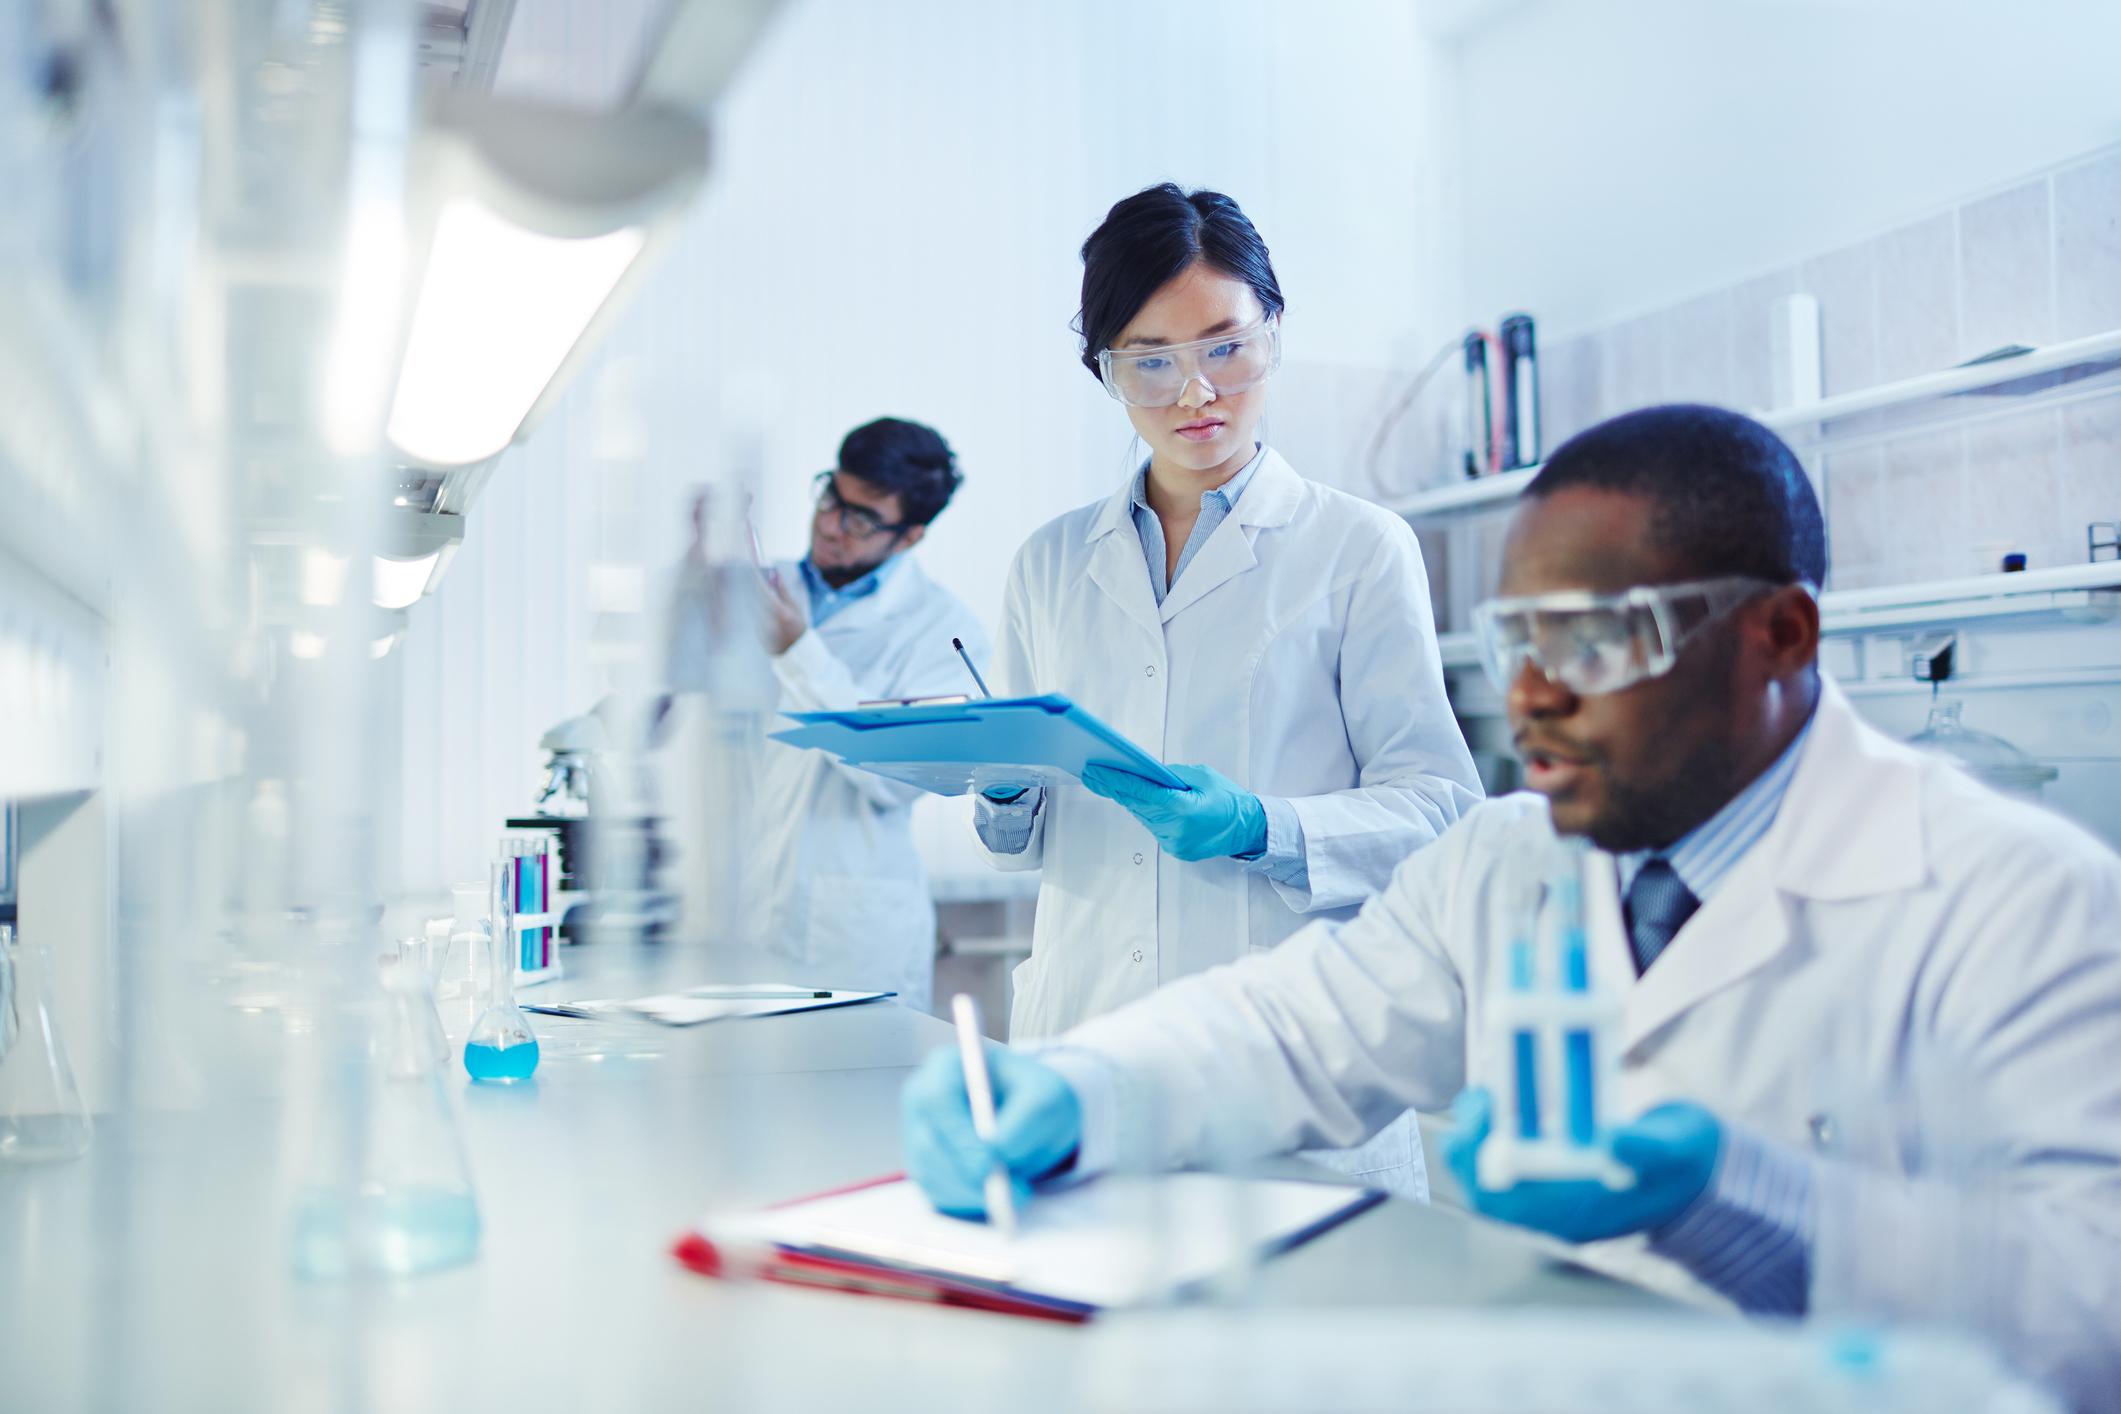 Three laboratory technicians at work